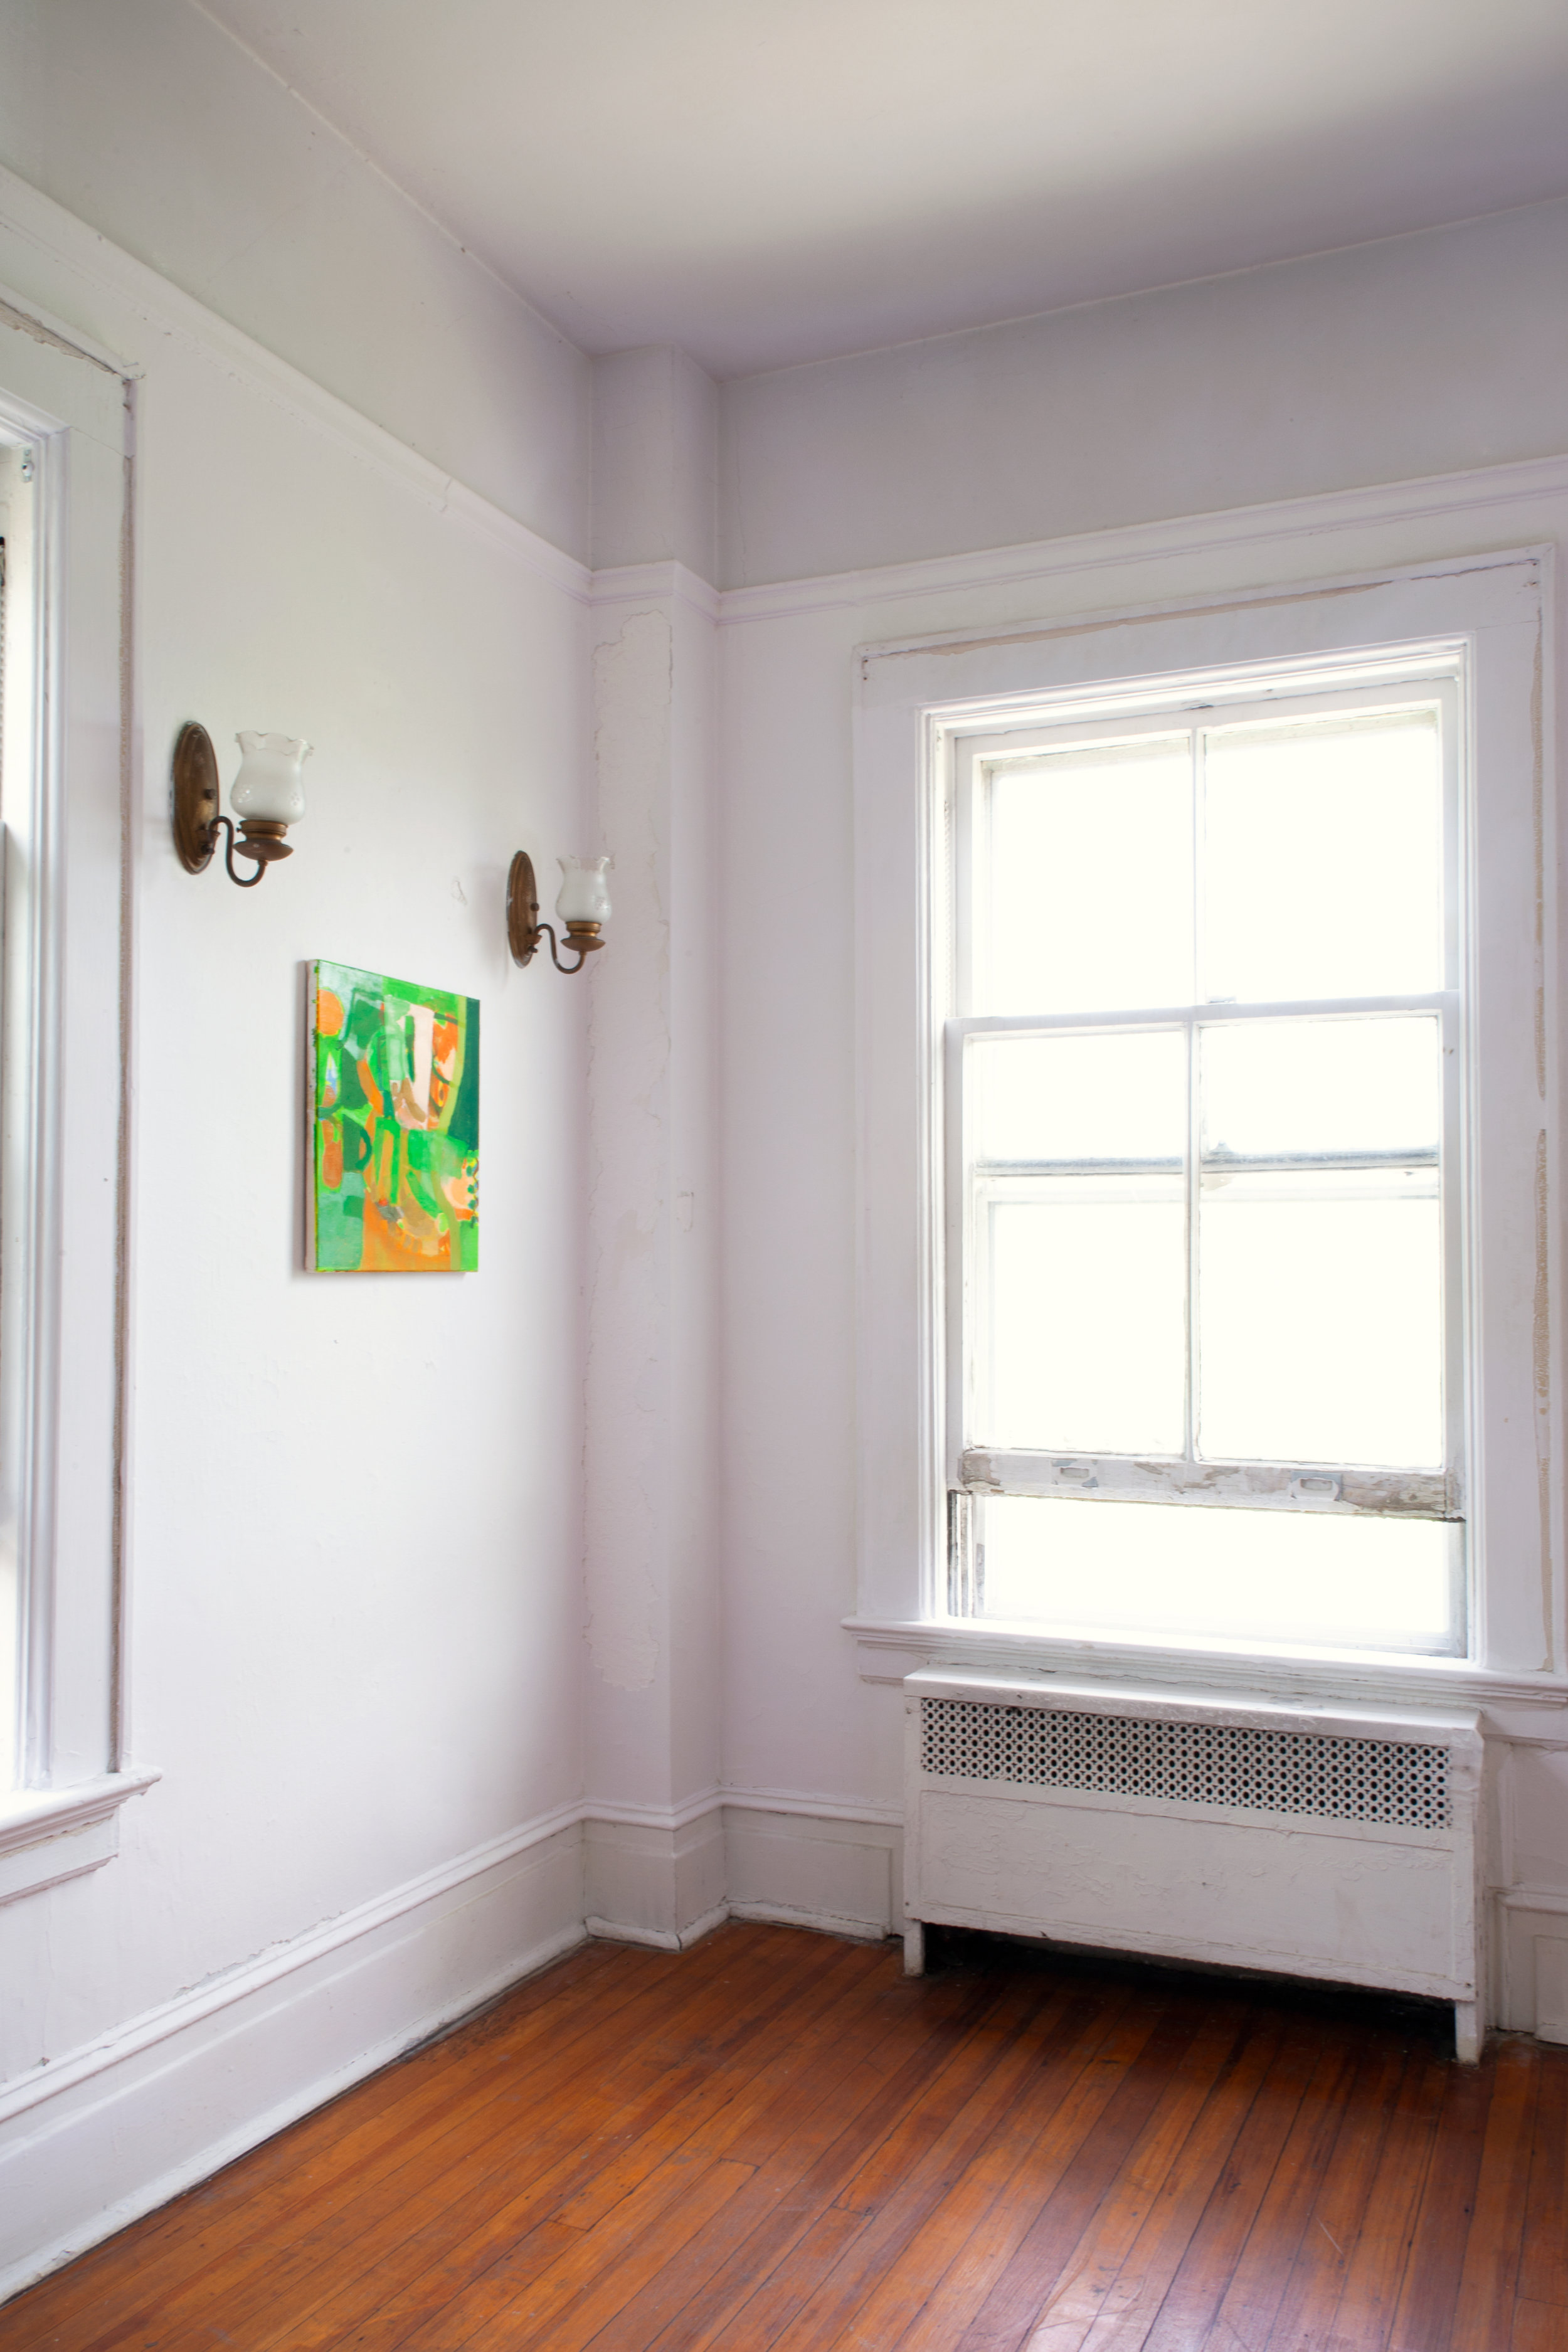 Meghan_Brady-NADA_House-2019-installation_view_06.jpg